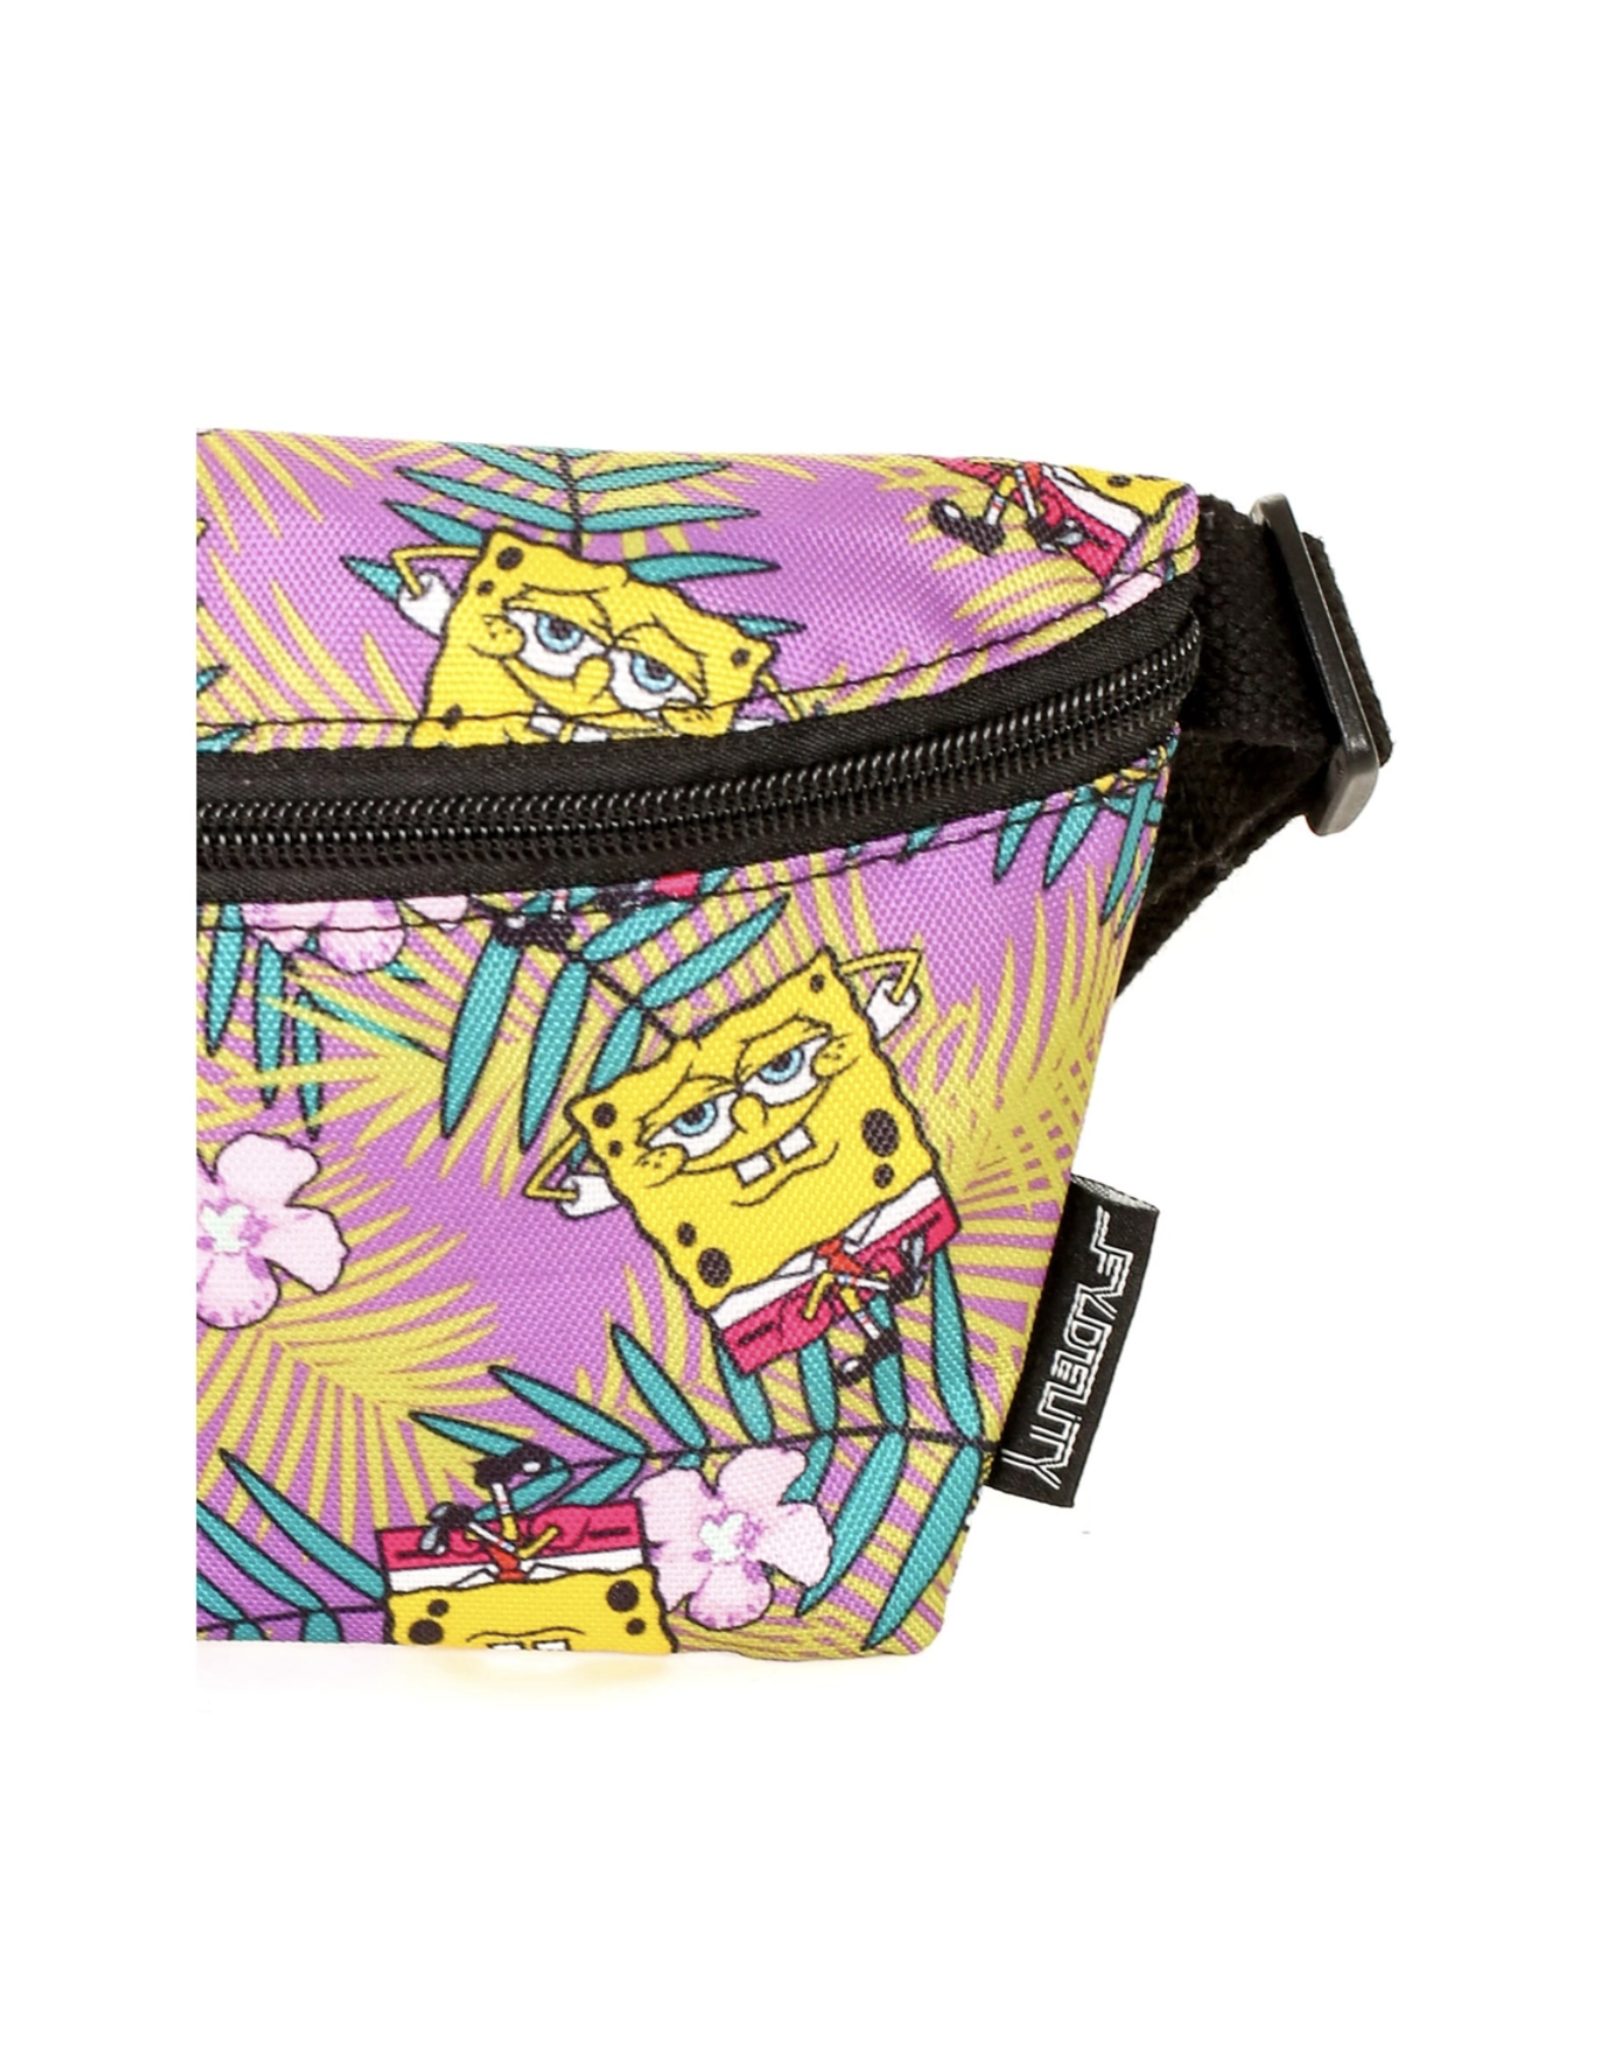 Spongebob Fanny Pack